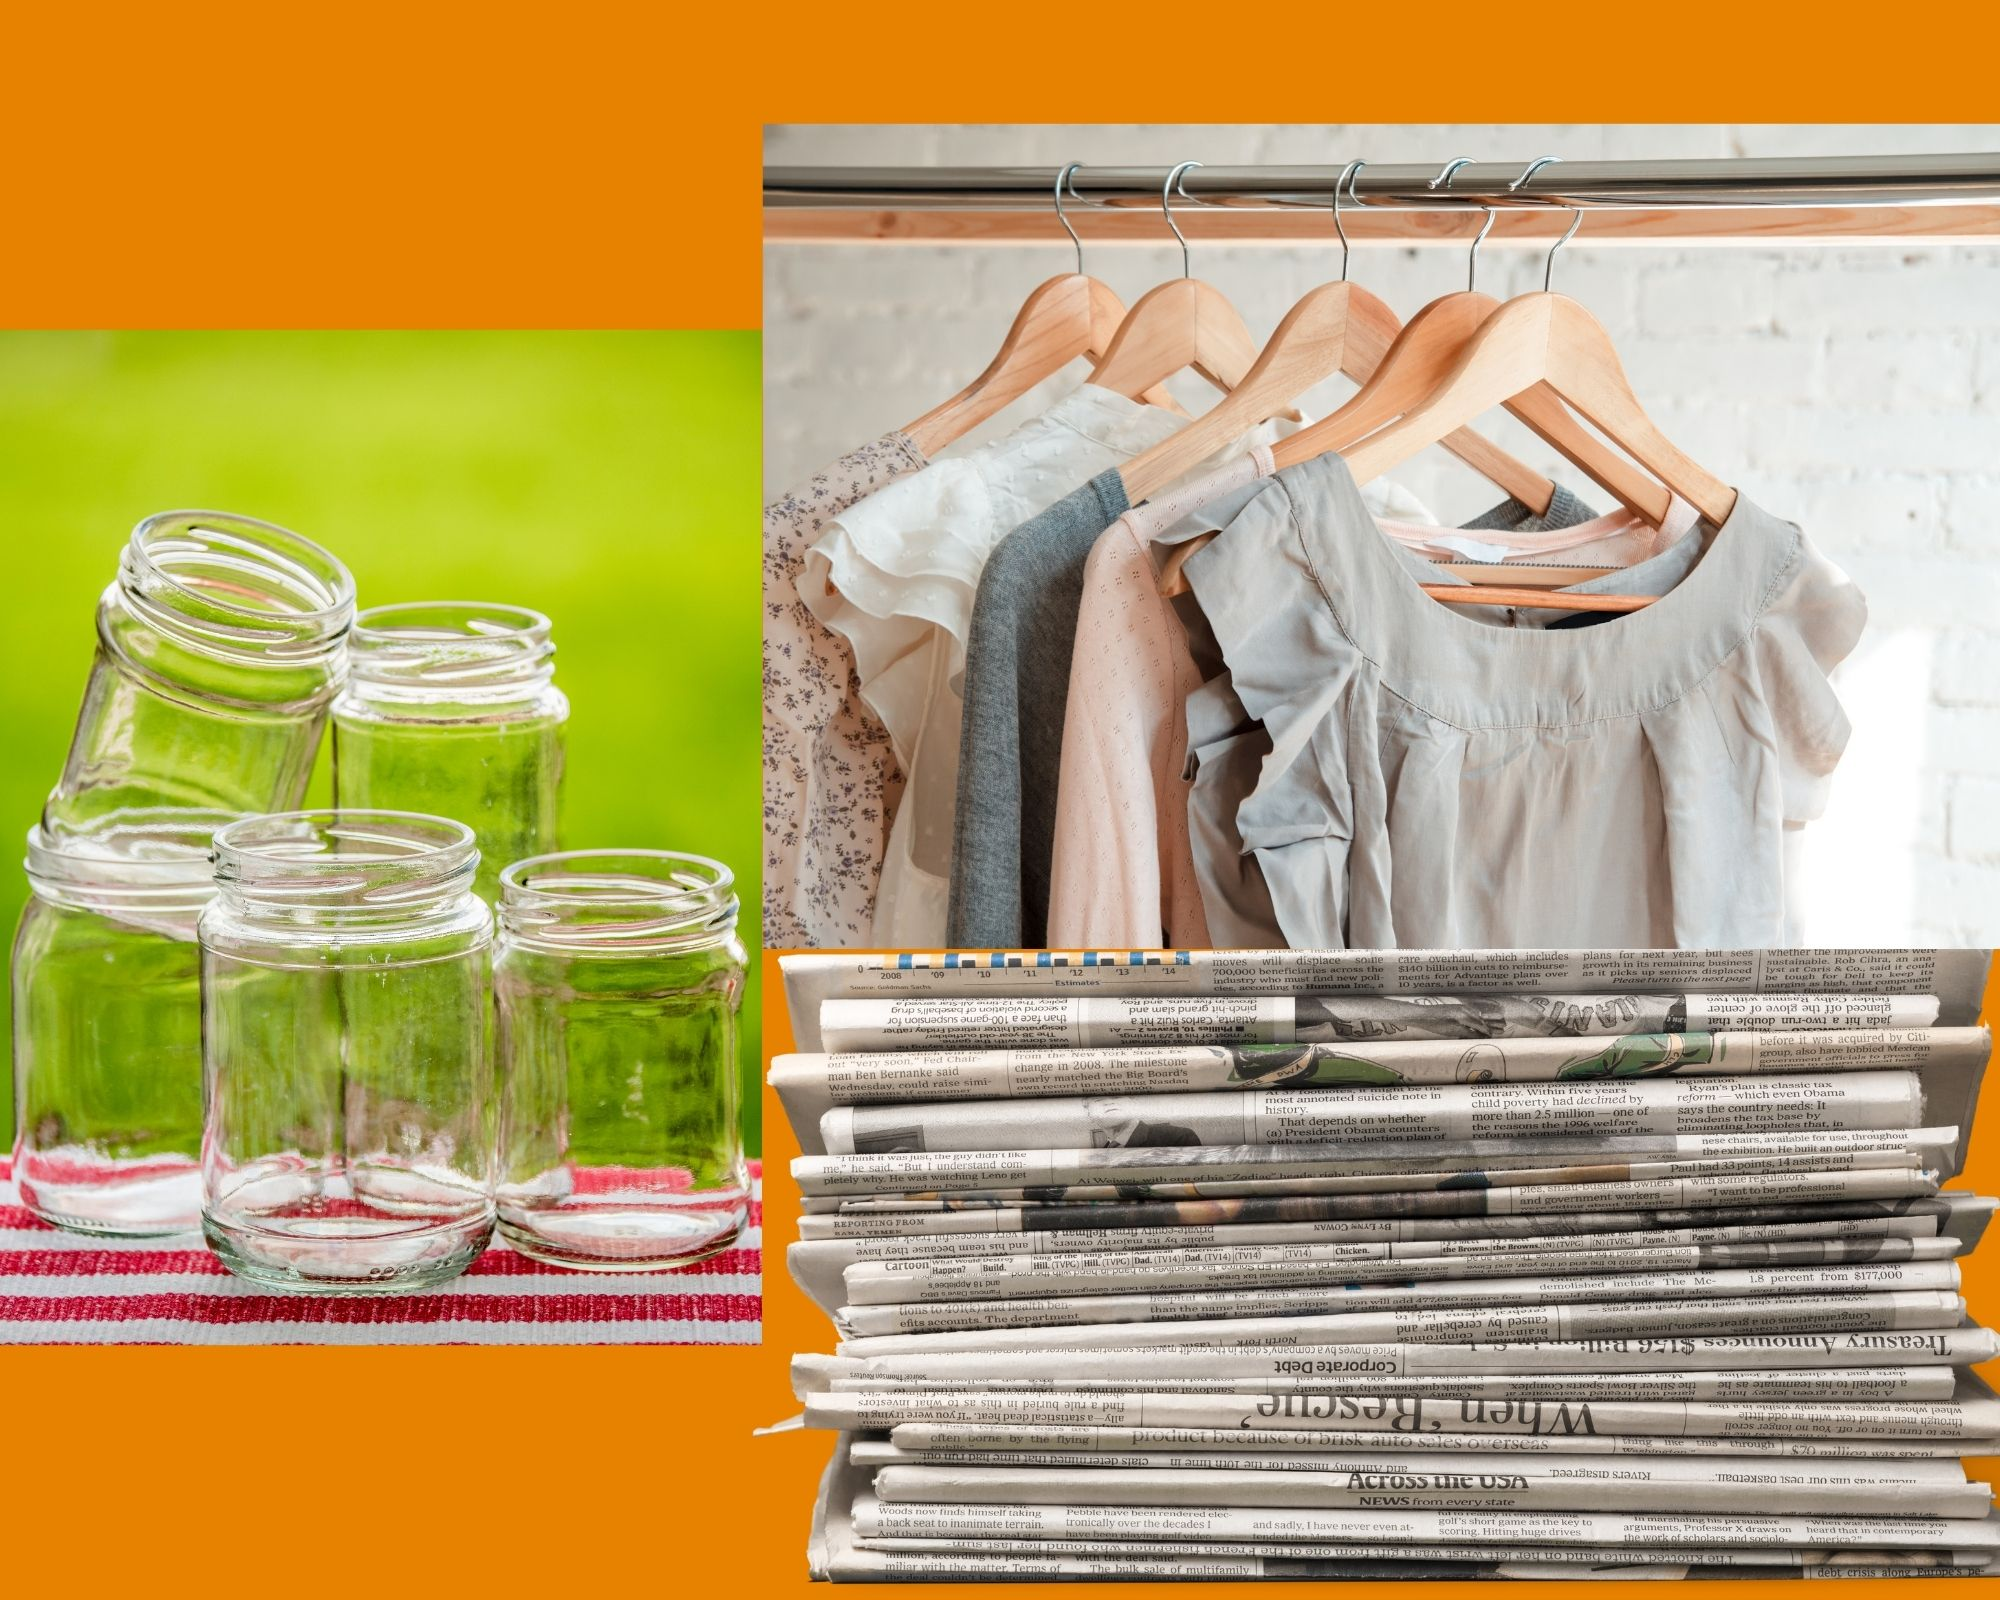 jars, hanging shirts and folded newspaper